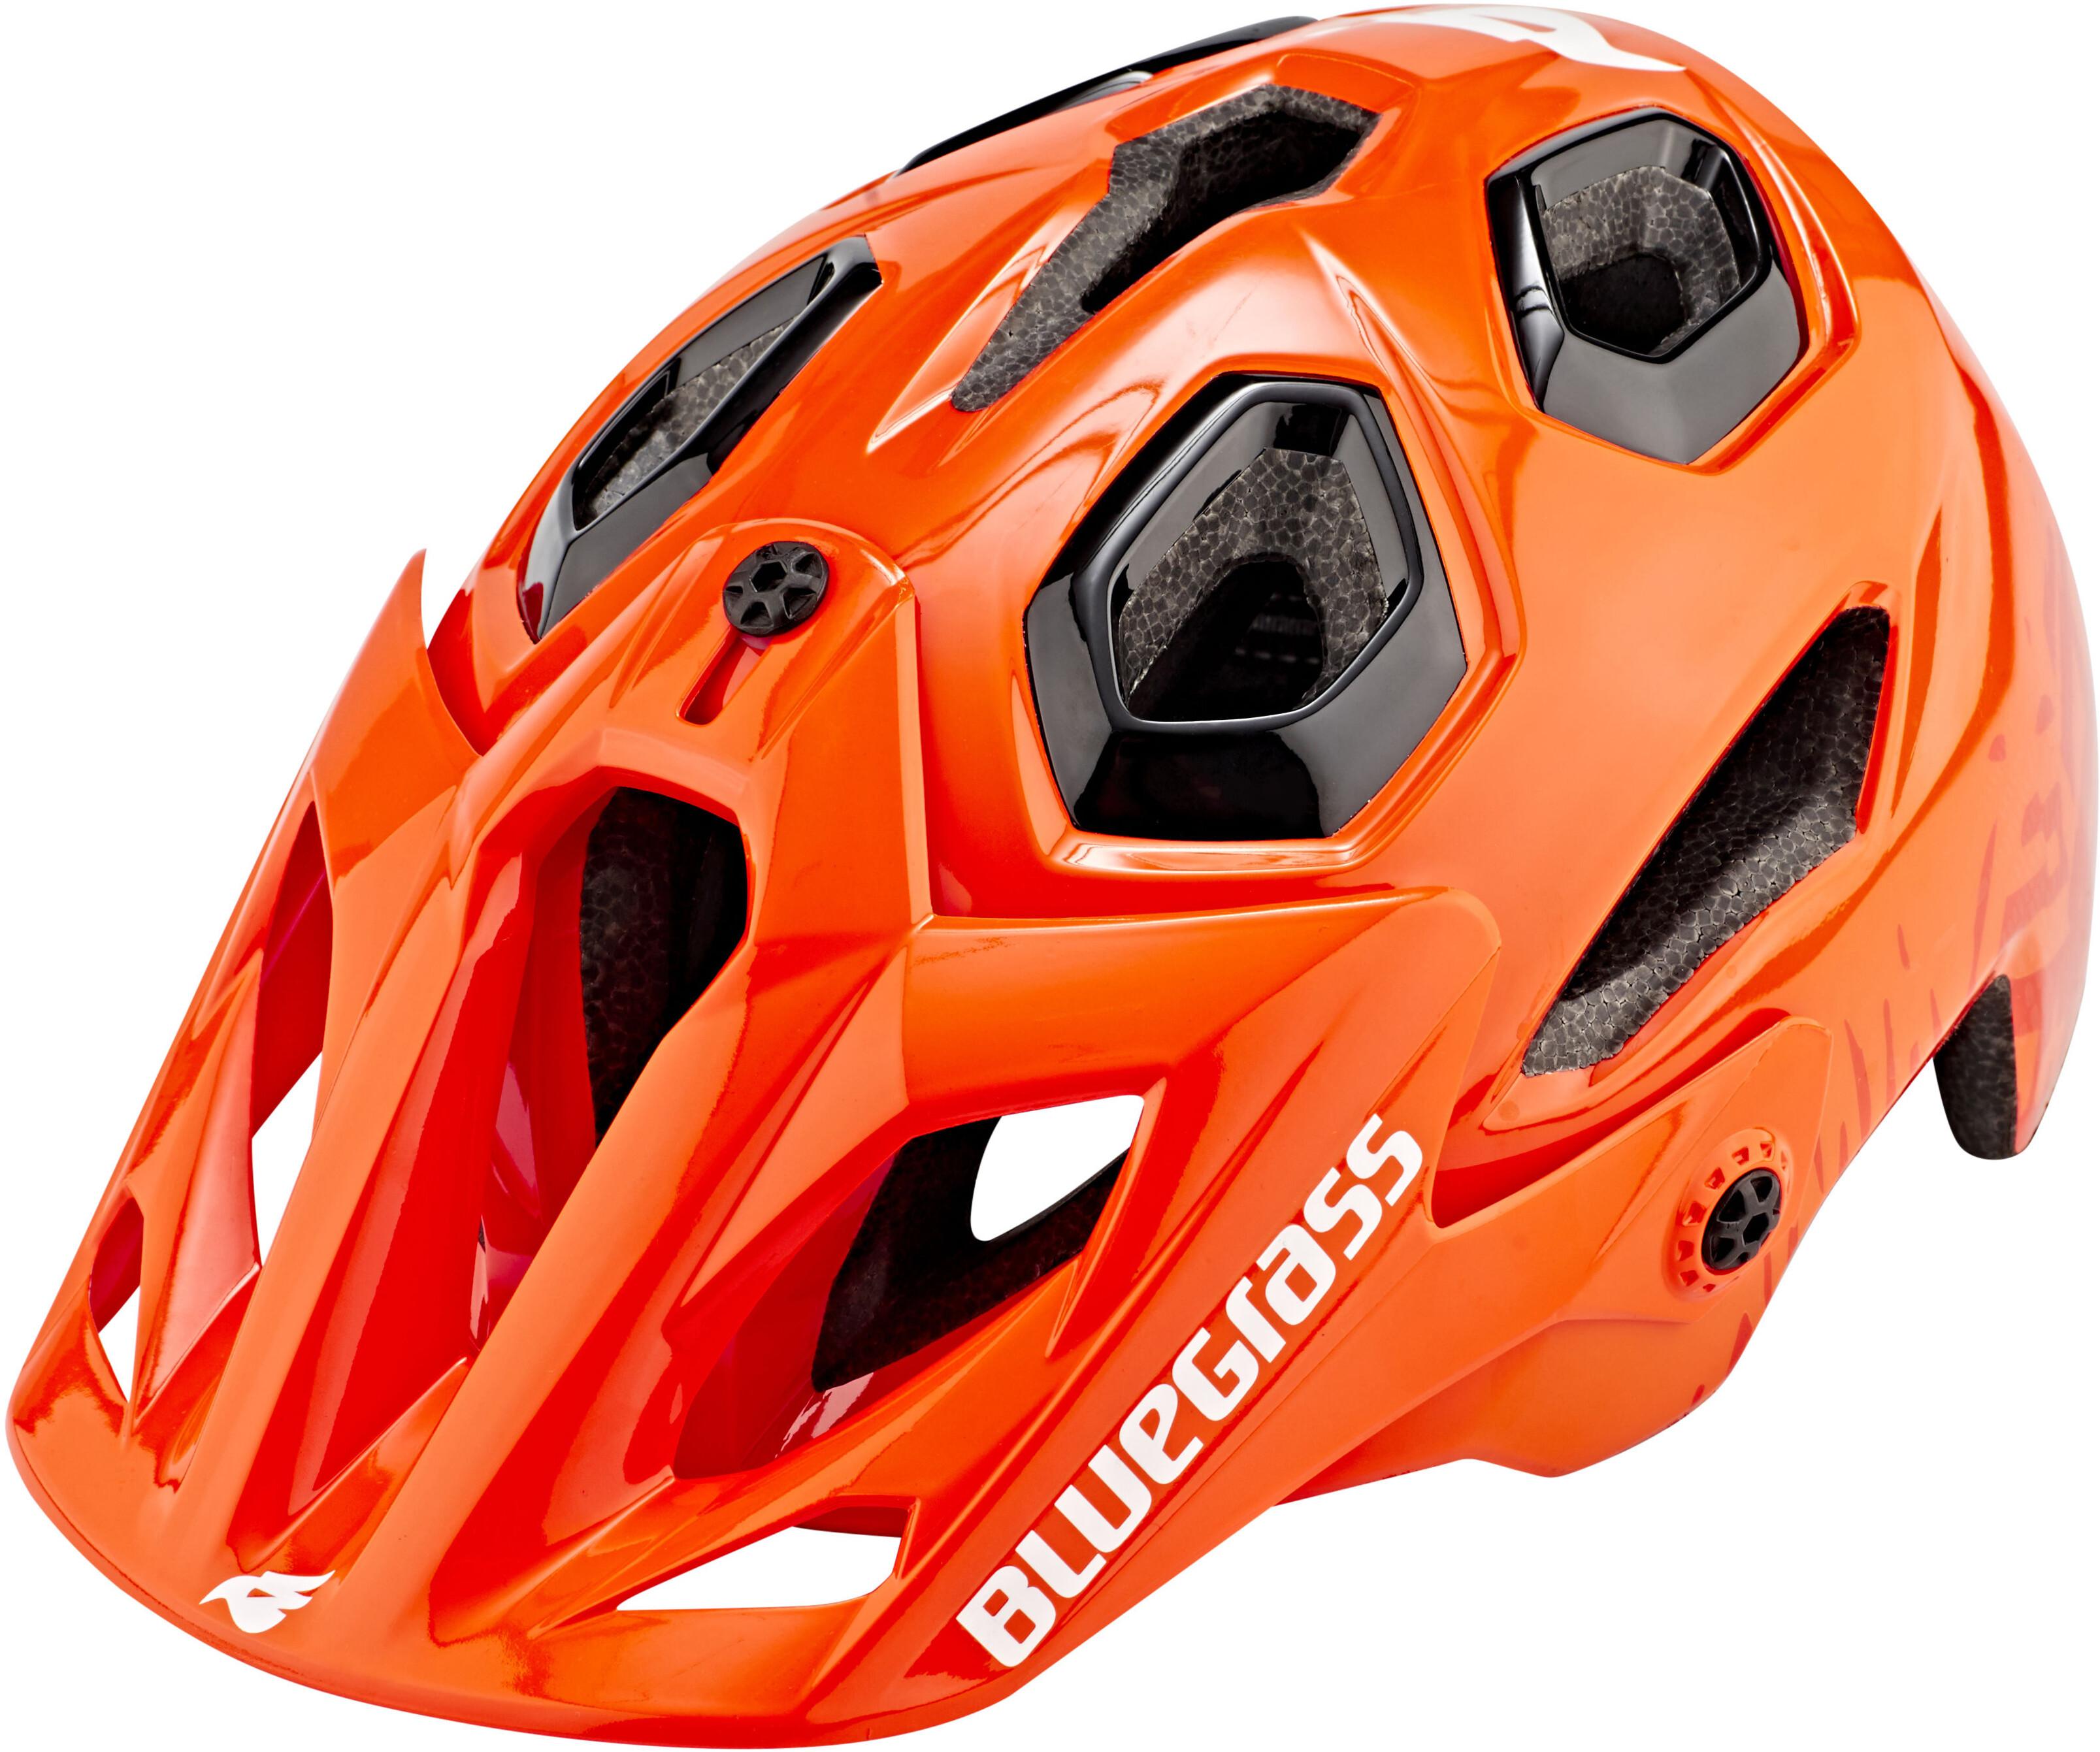 Orange Mountain Bike Helmet American Bathtub Refinishers Lixada Bontrager Helmets For Sale Bikeexchangecom